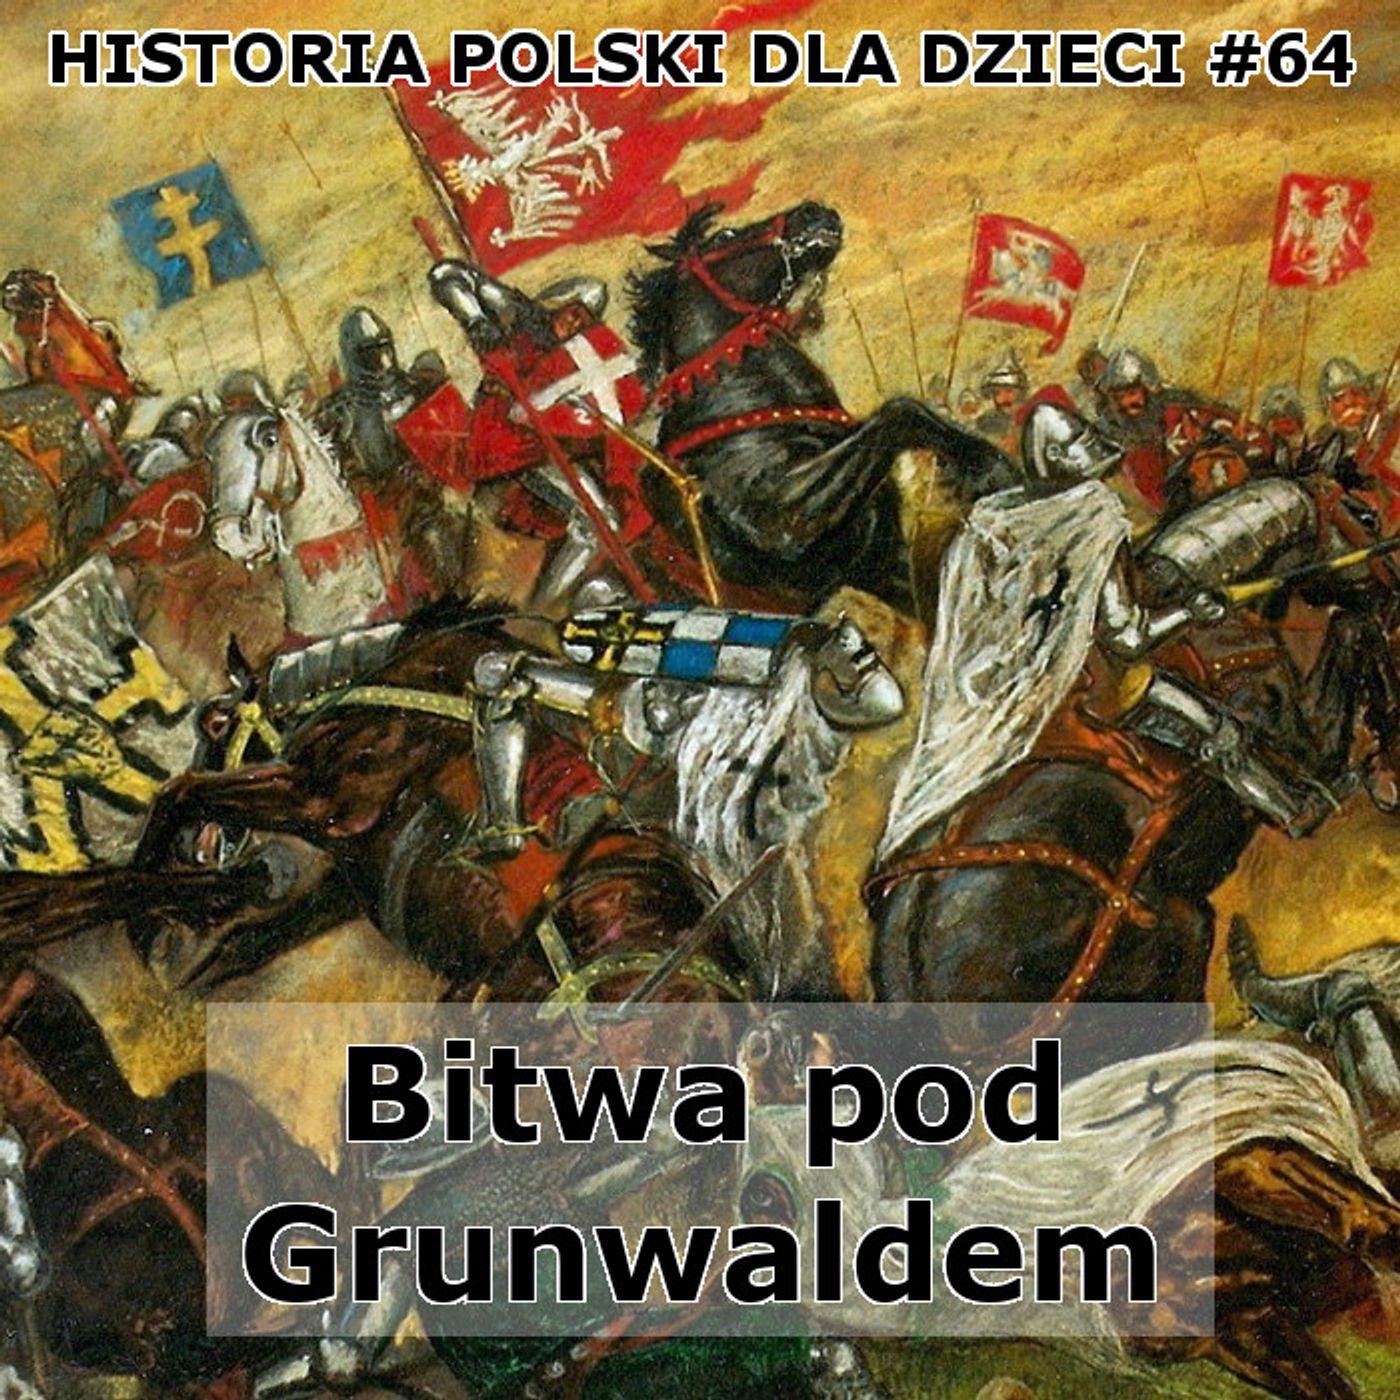 64 - Bitwa pod Grunwaldem 2